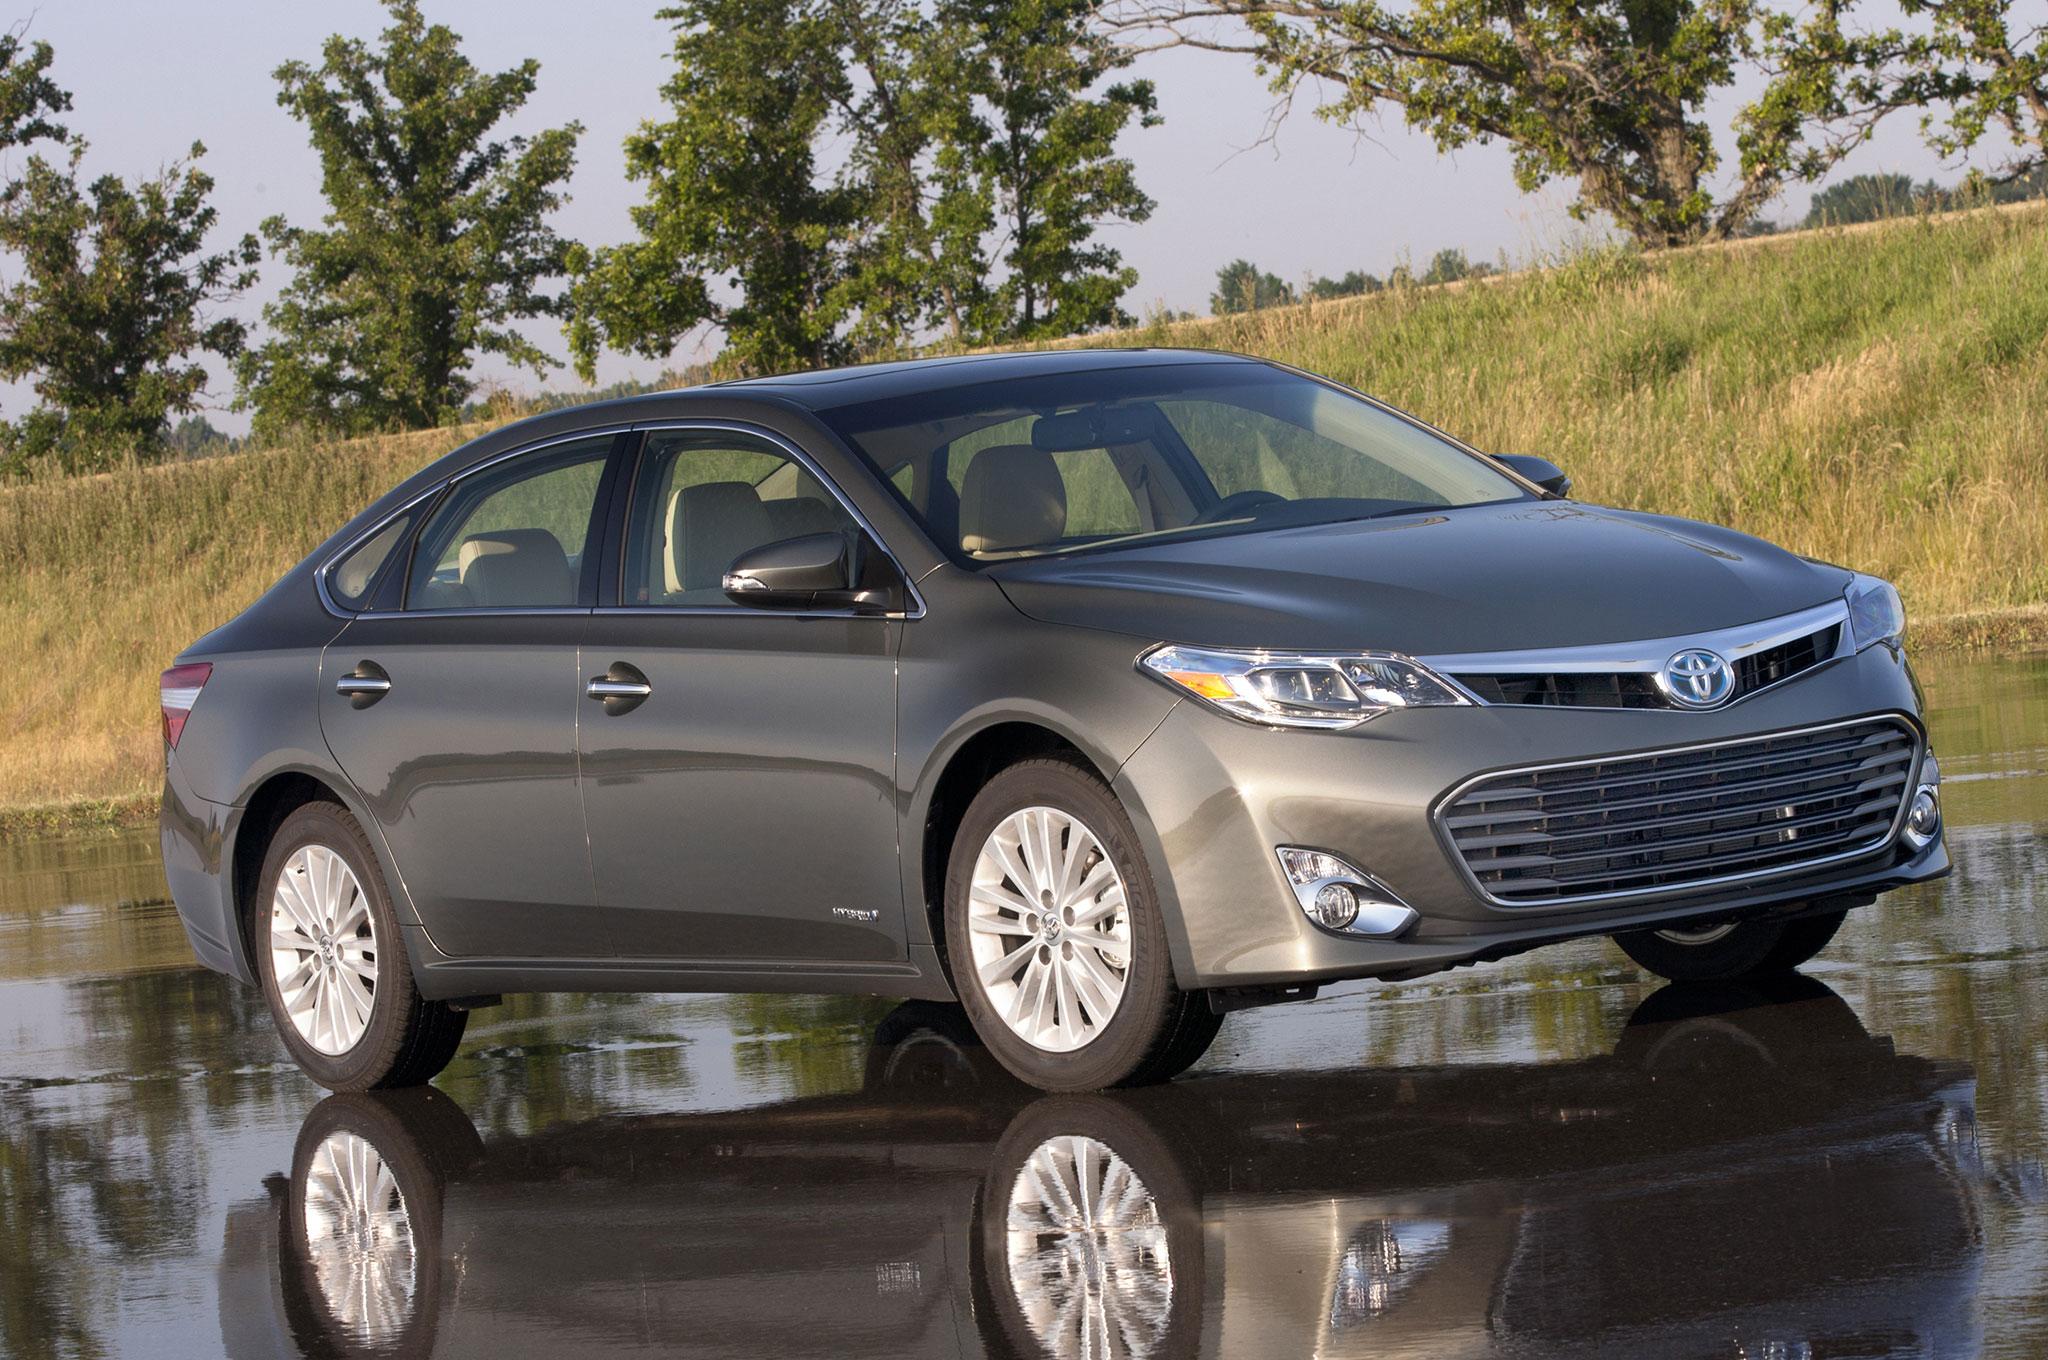 2014 Toyota Avalon Hybrid Three Quarters Front View1